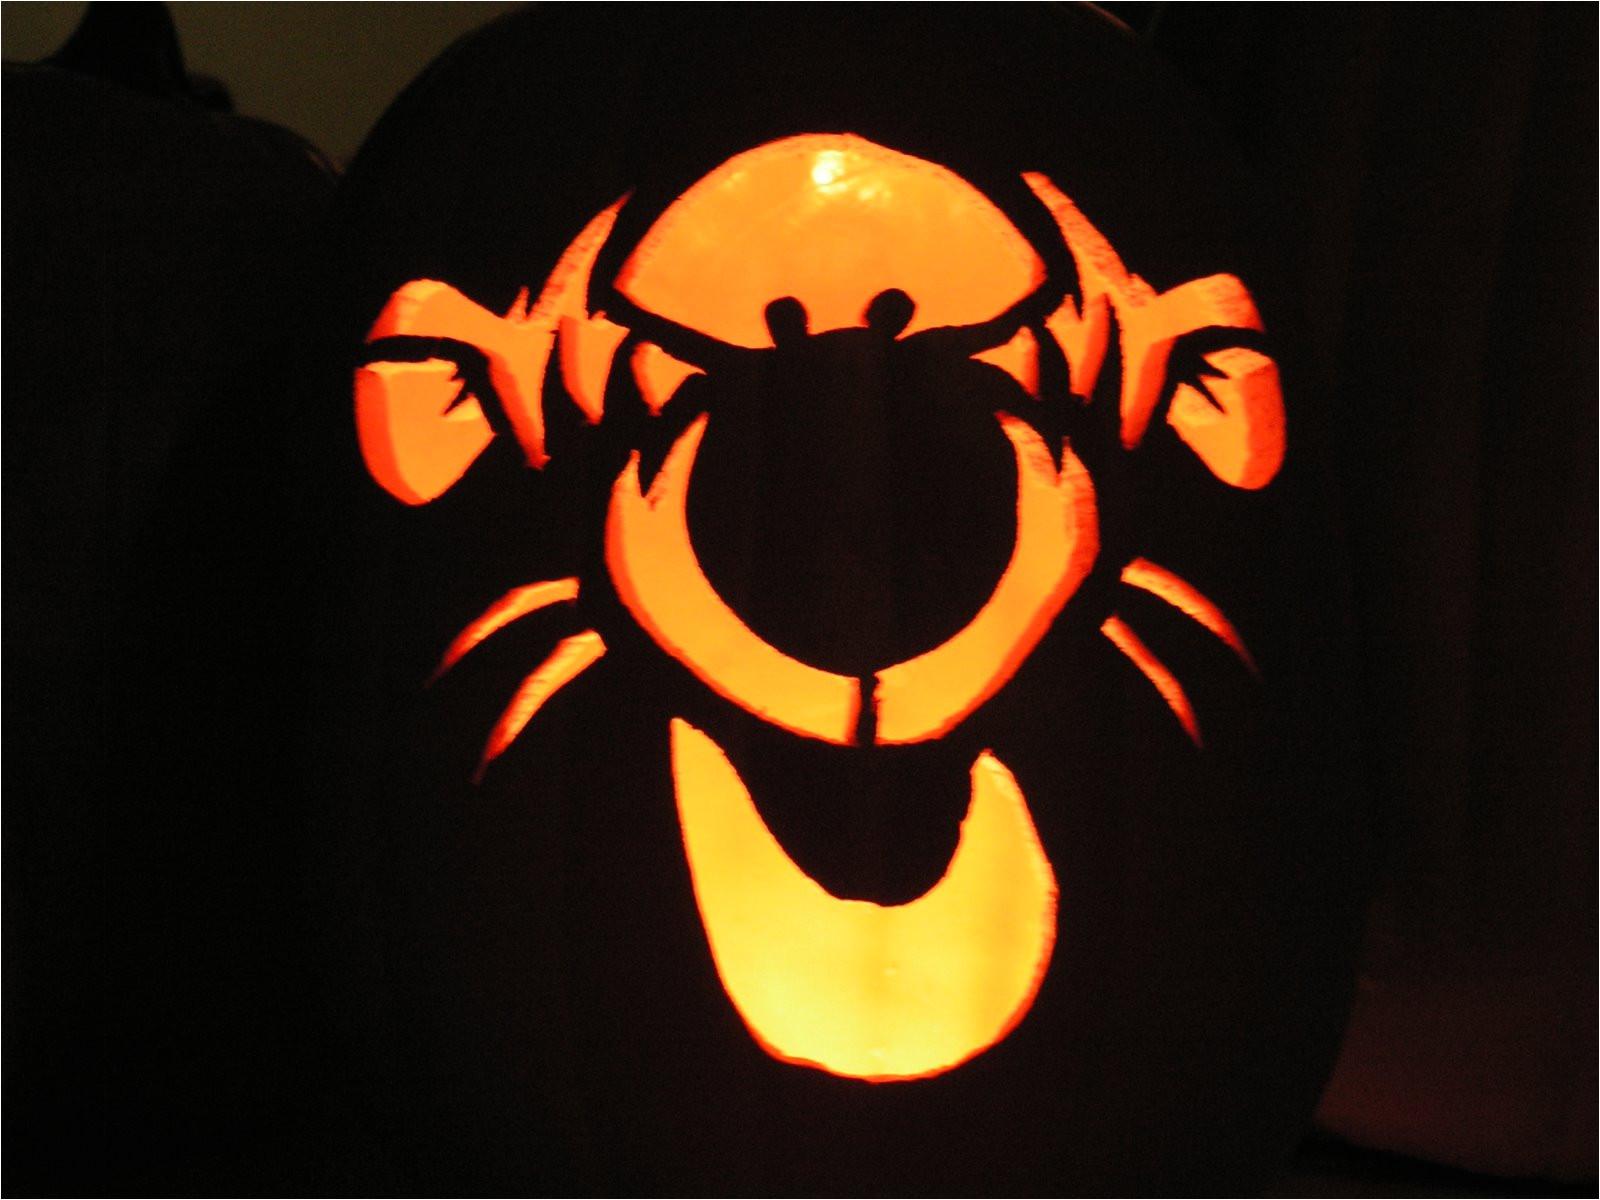 Winnie the Pooh Pumpkin Carving Templates Pumpkin Carving Templates